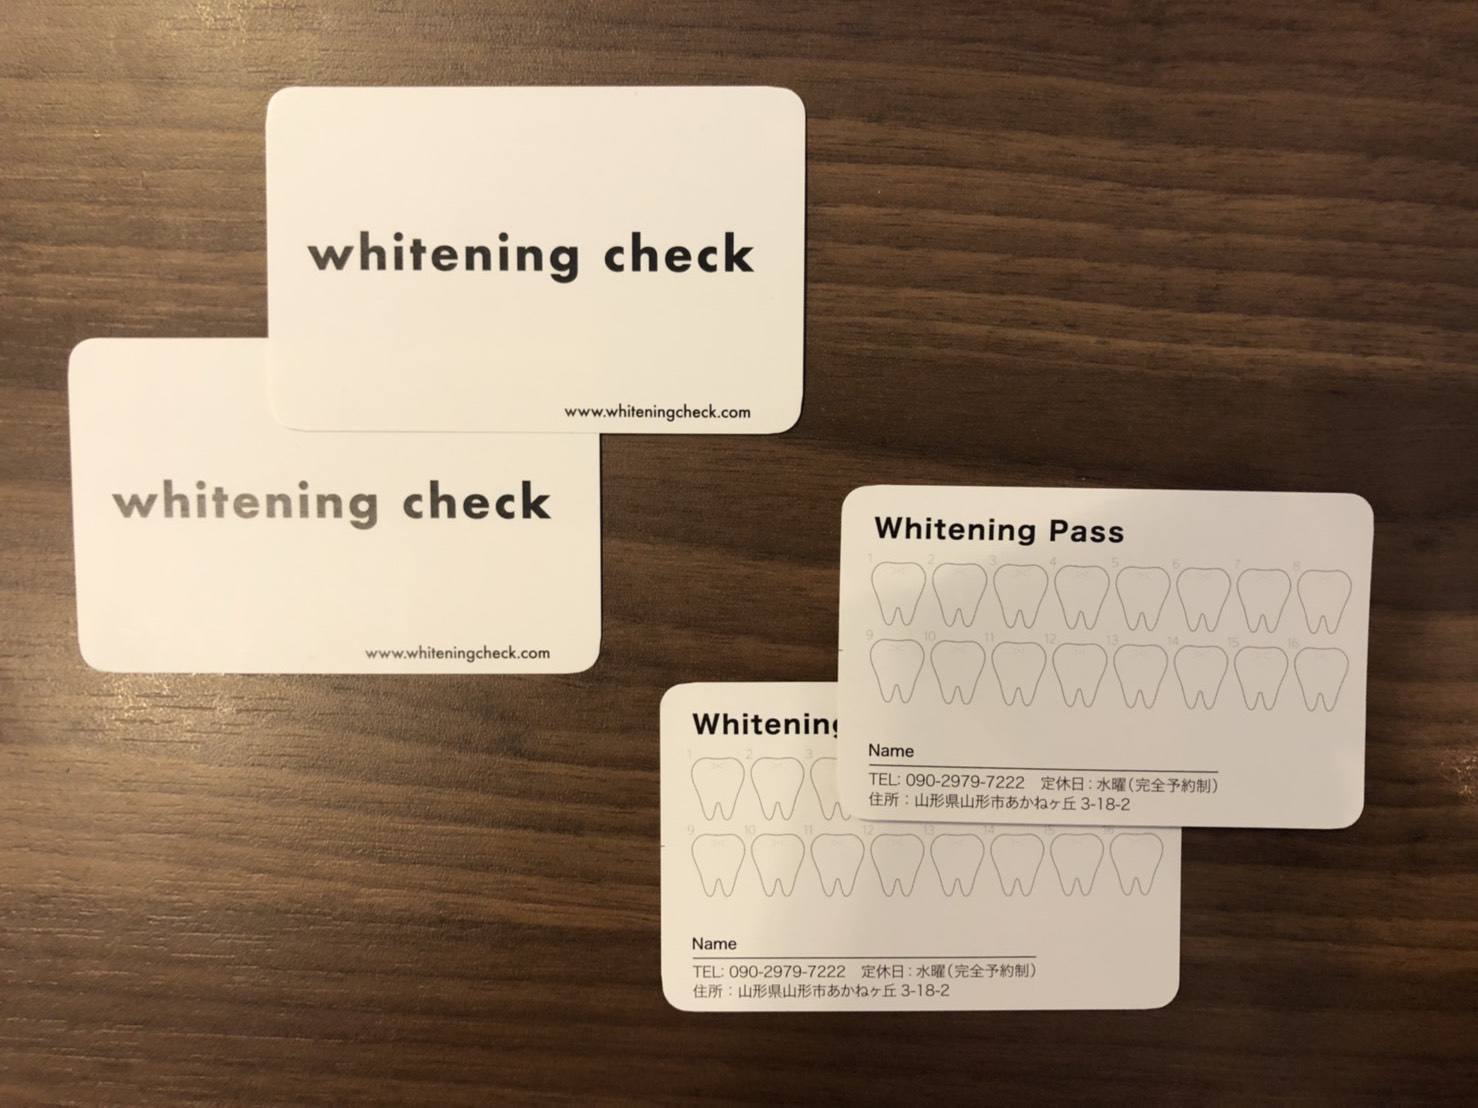 whiteningcheck1004